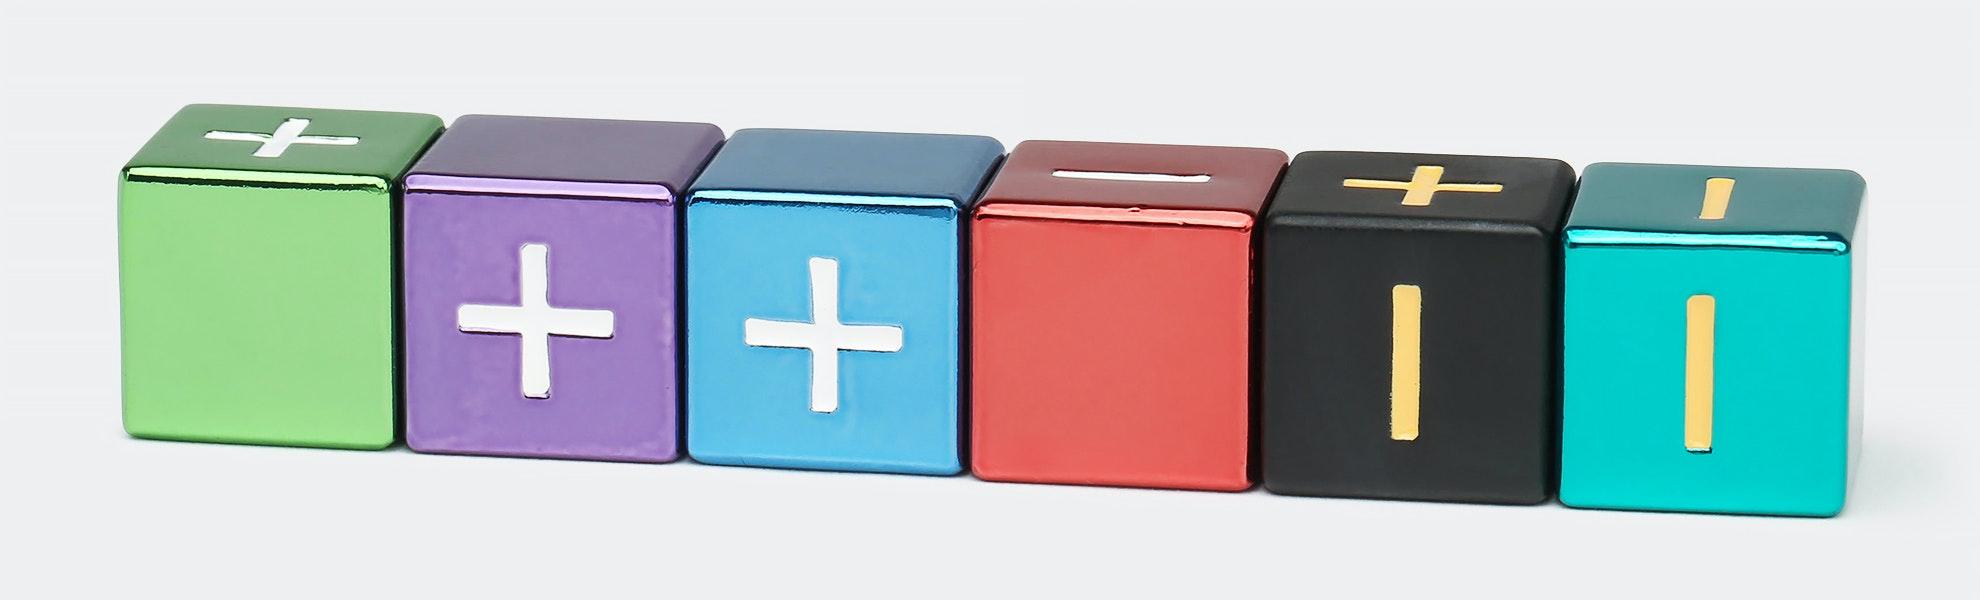 MDG Metallic Fate Dice Assorted Colors Set